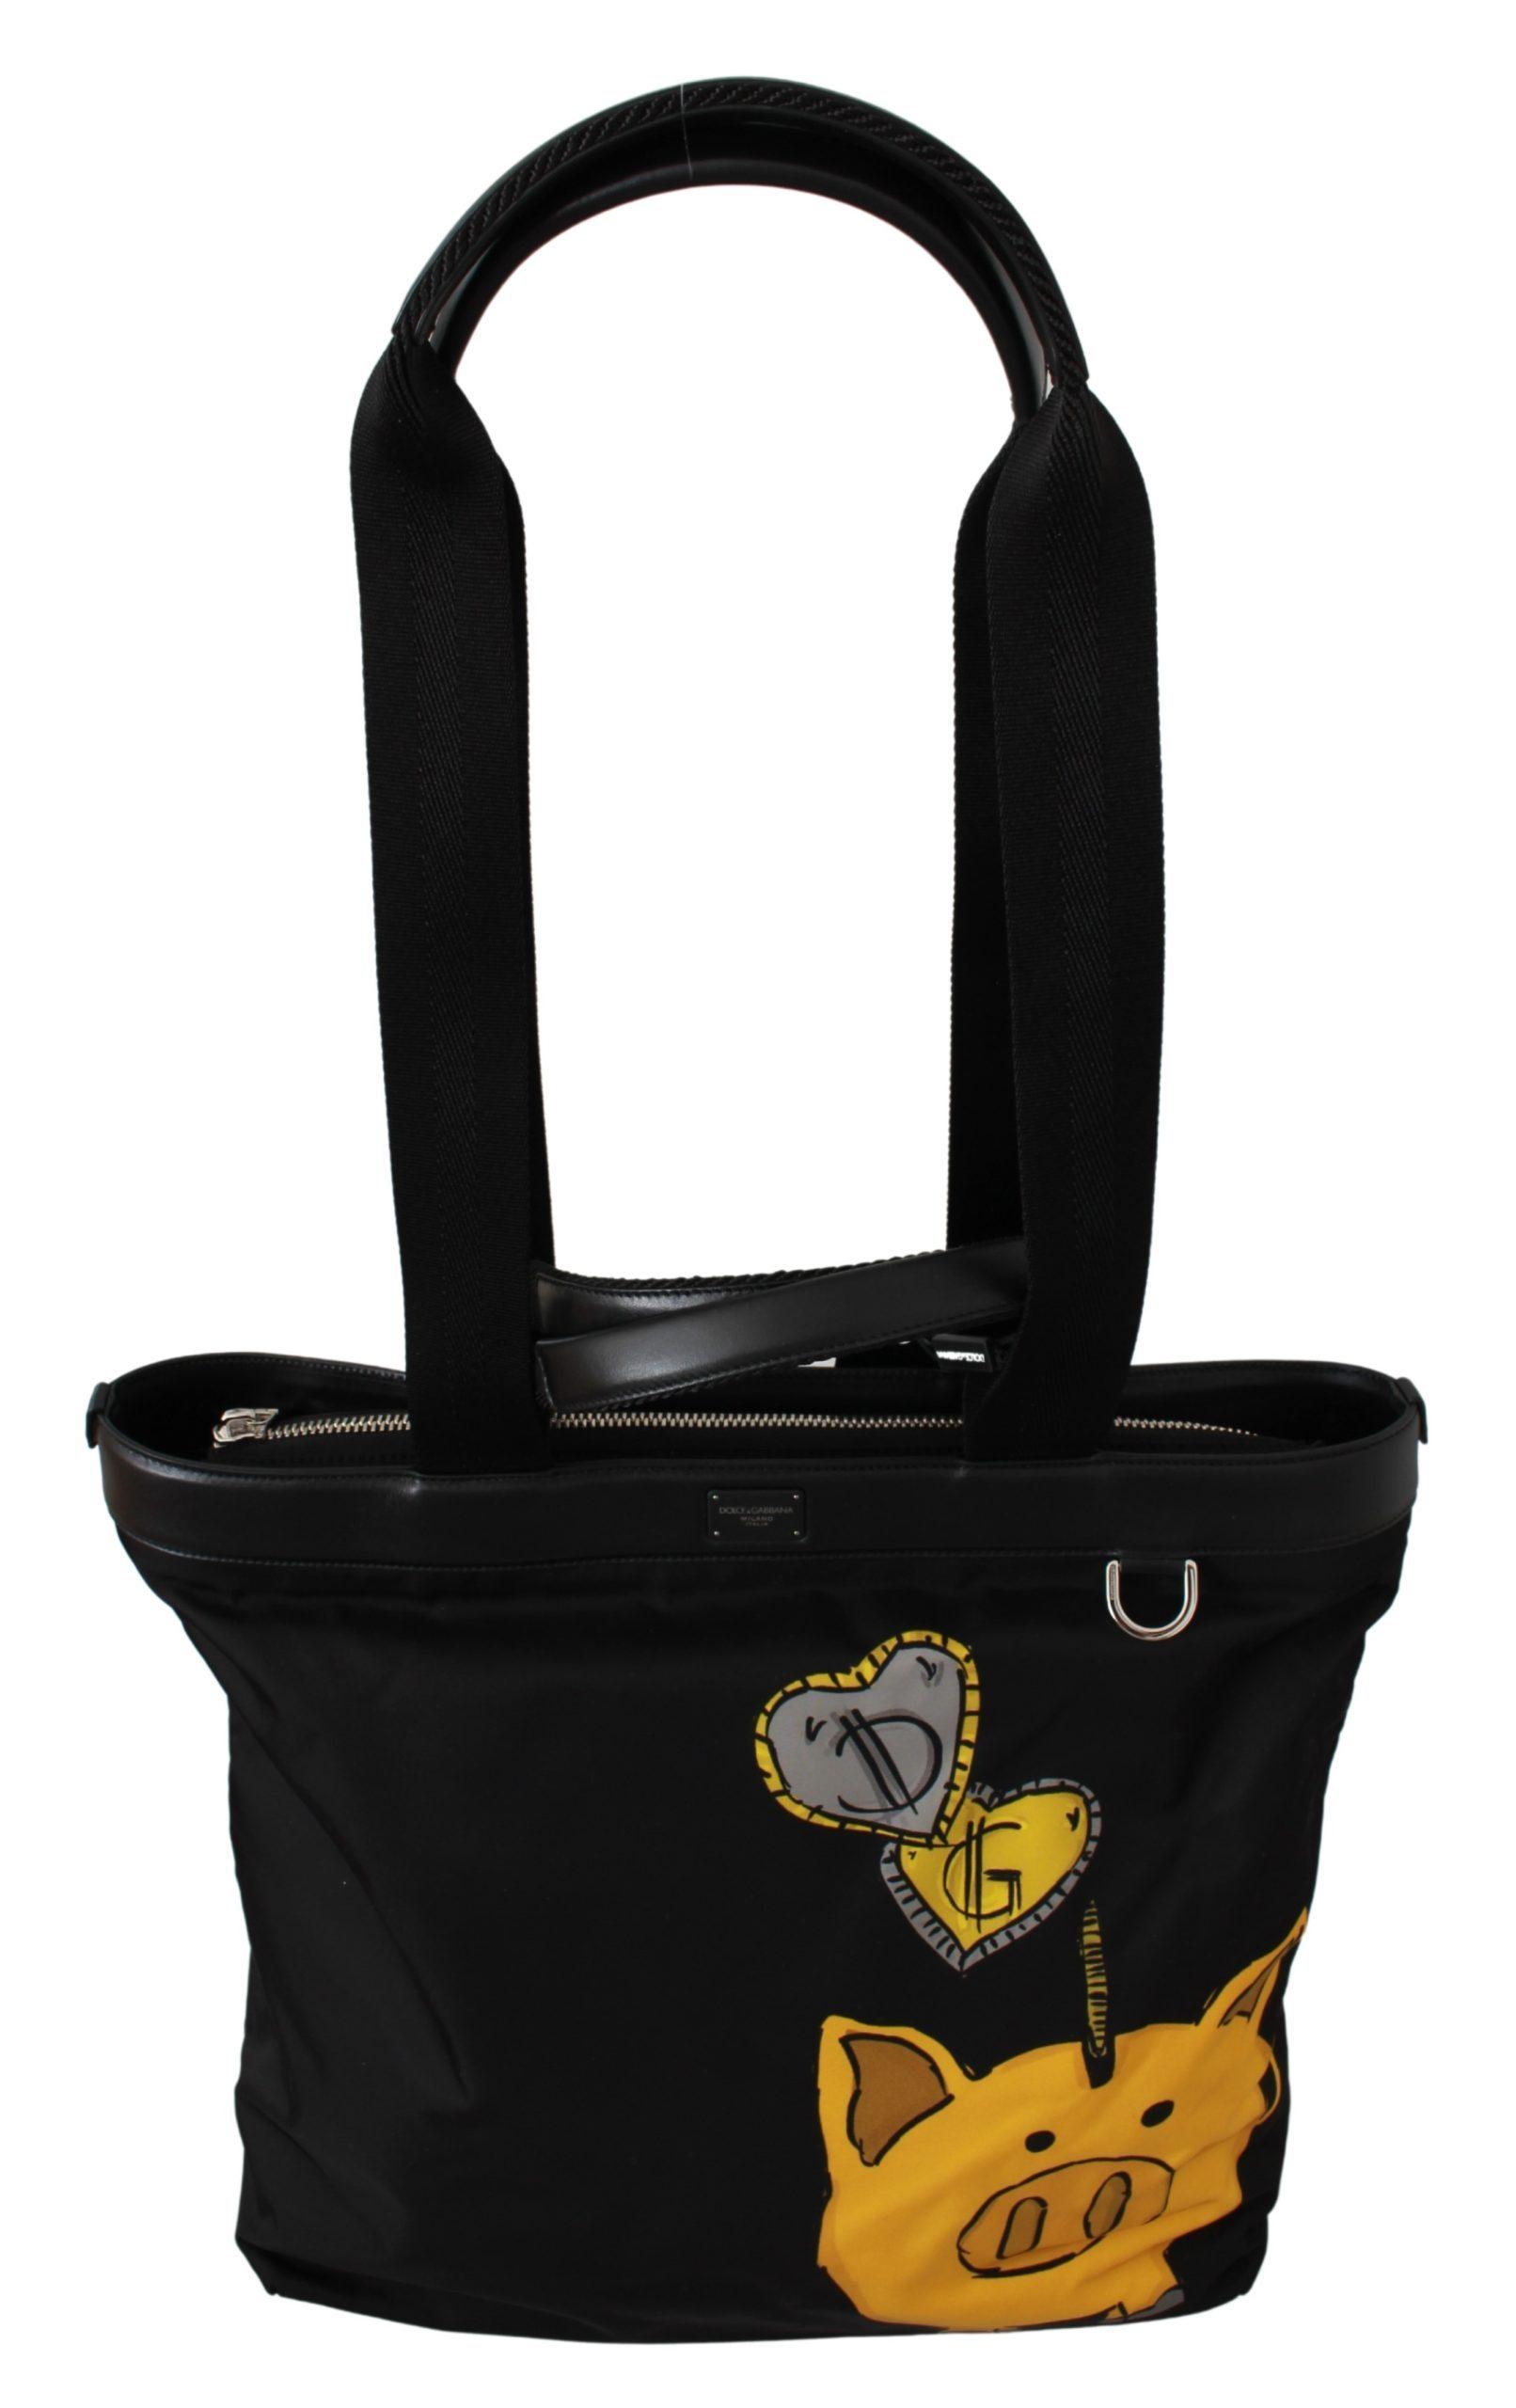 Dolce & Gabbana Women's Year Of The Pig Shopping Tote Bag Black VAS9457